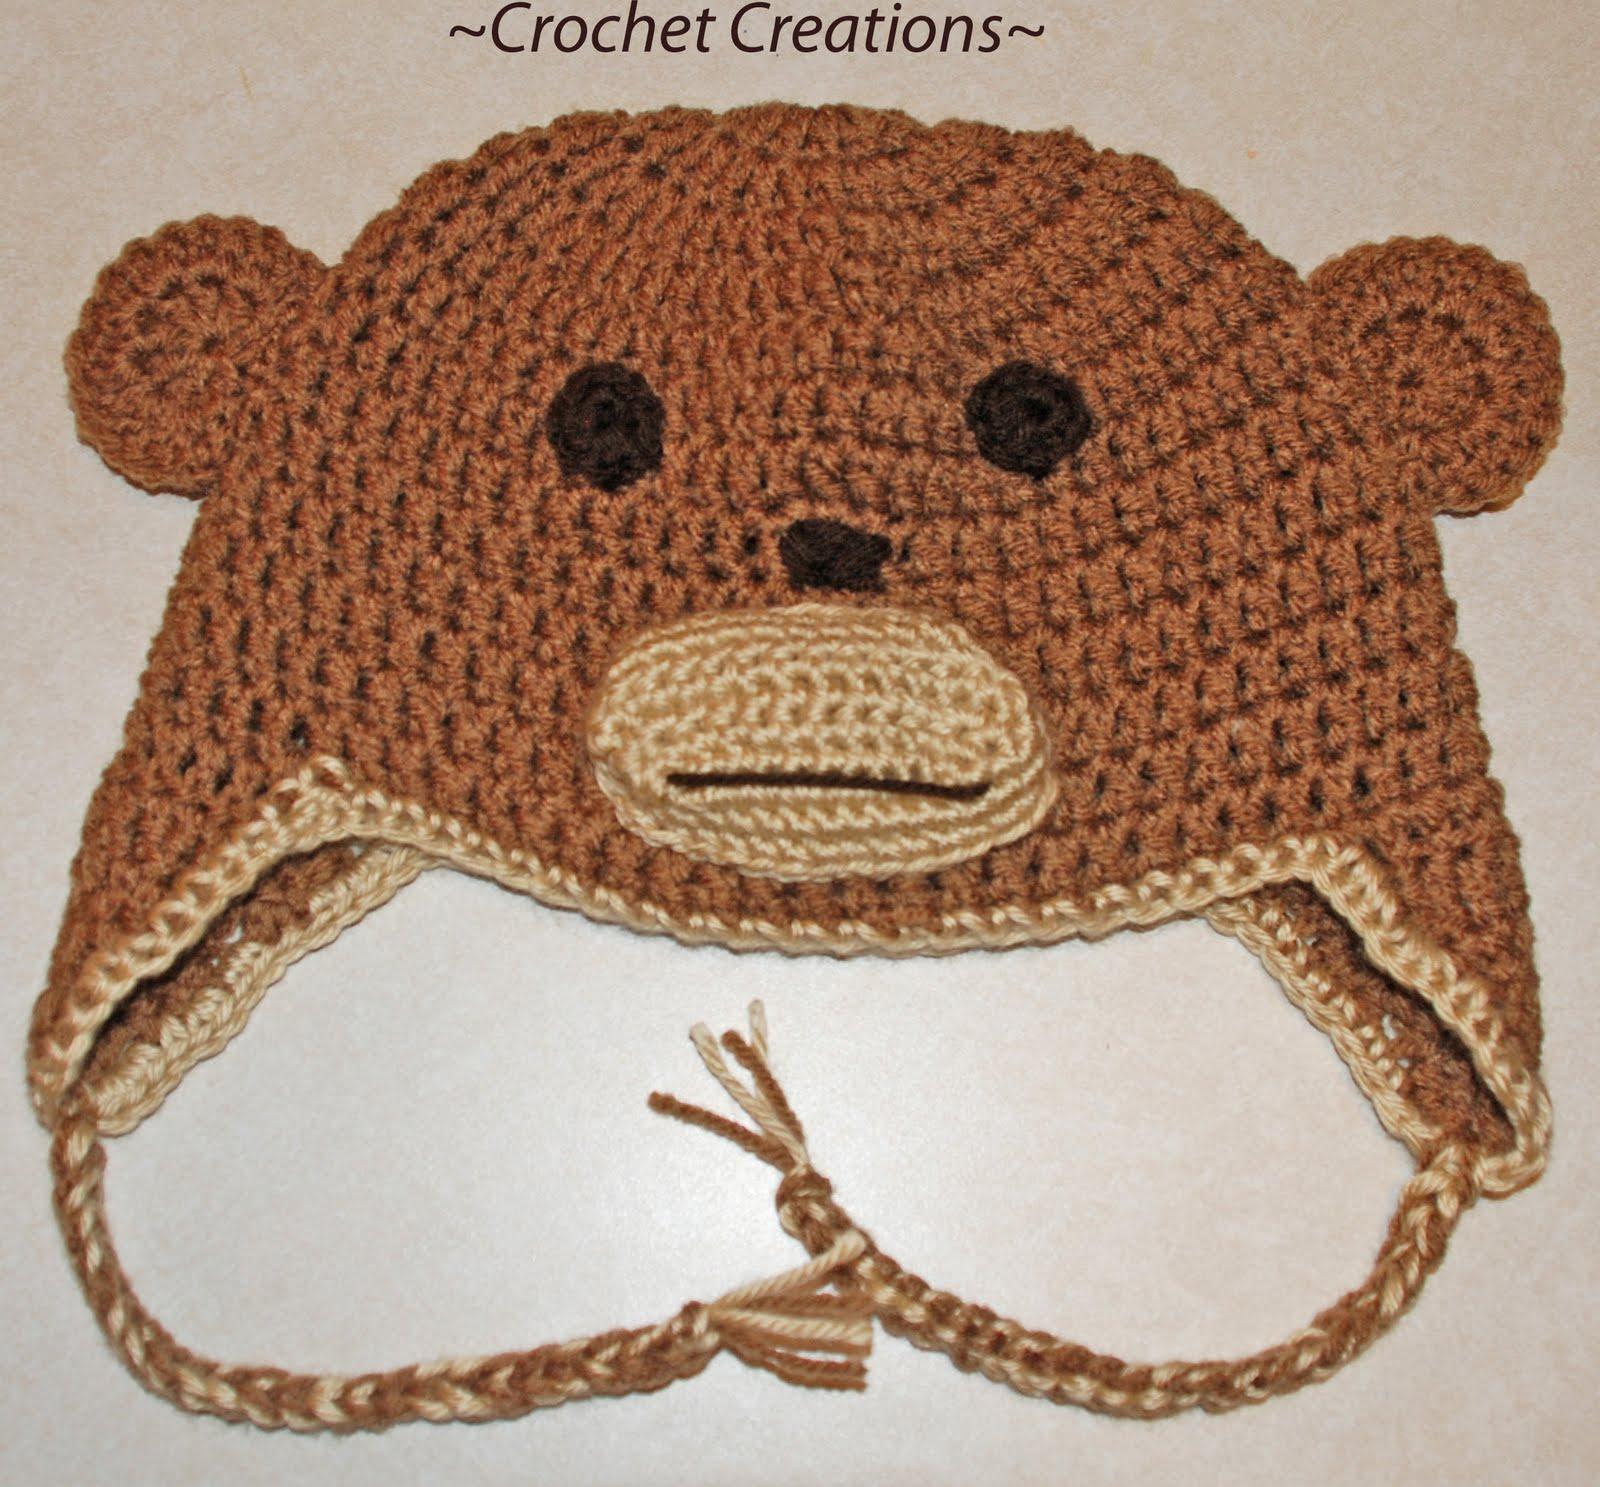 Amys Crochet Creative Creations Crochet Monkey Child Ear Flap Hat